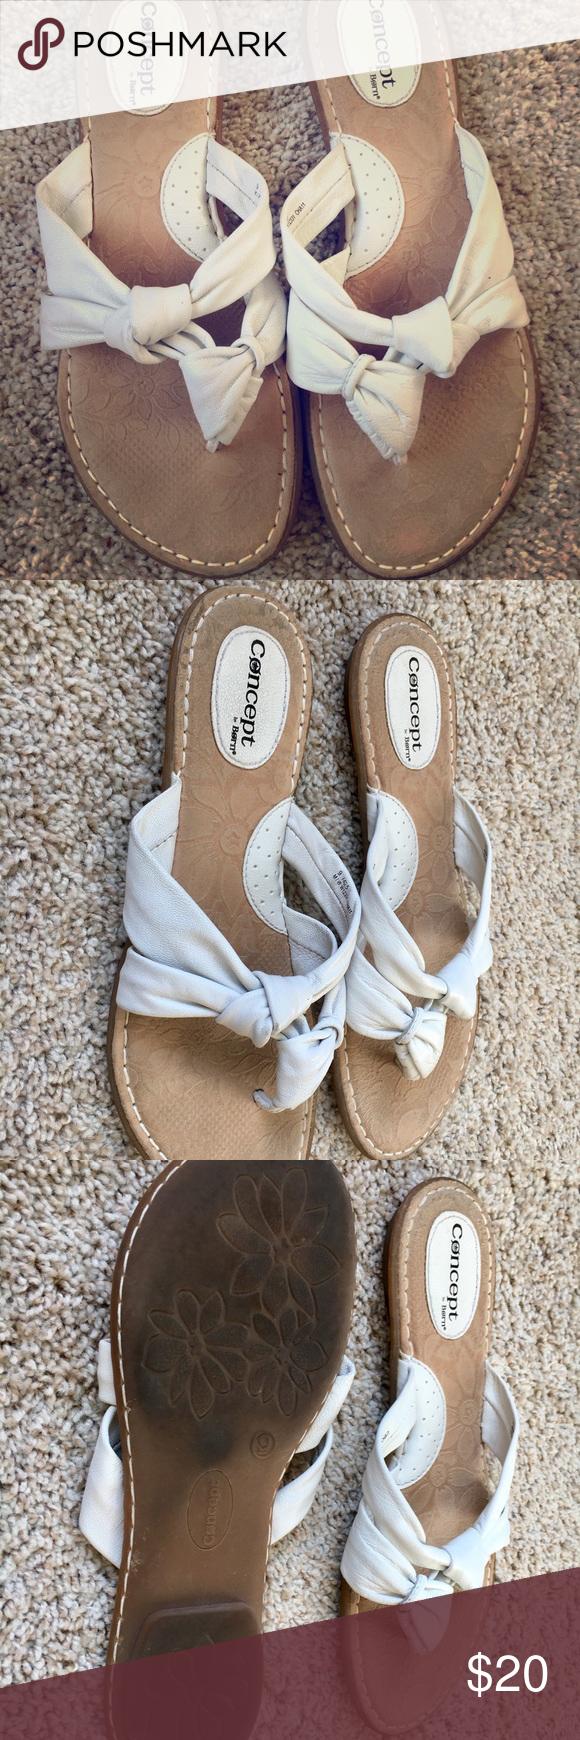 Sandals Leather white sandals Born